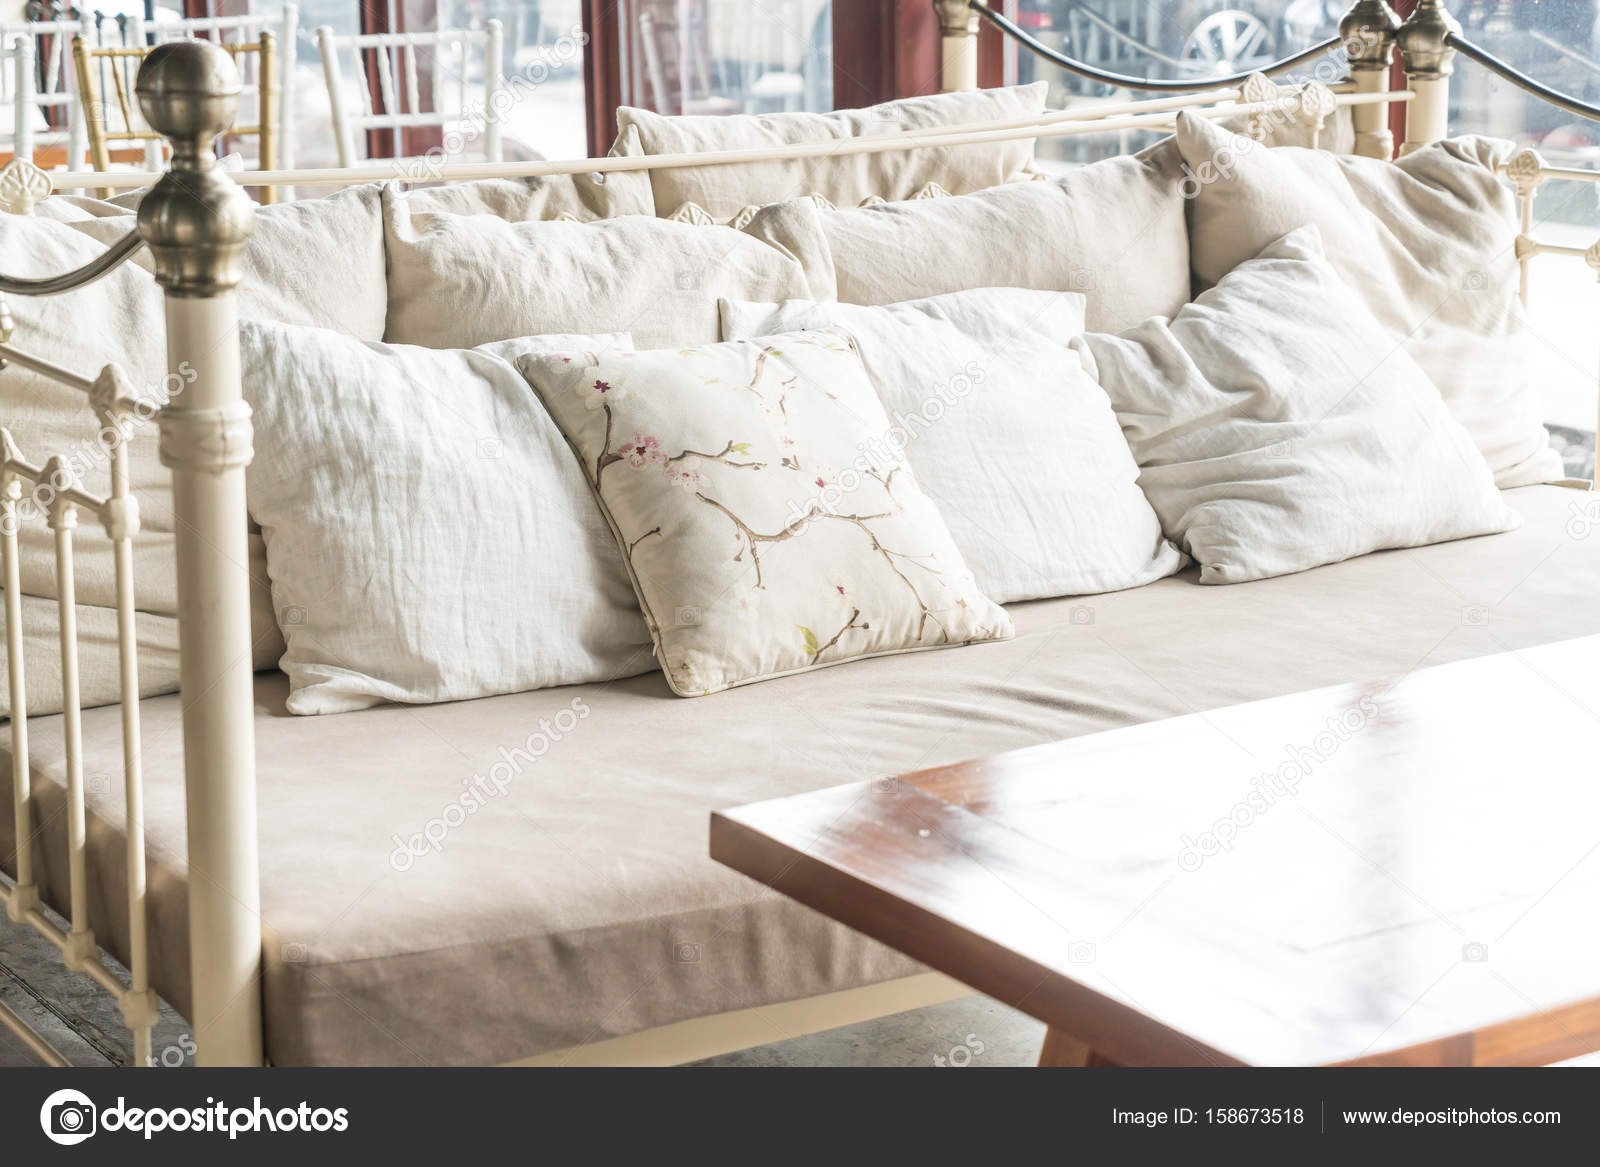 Schone Kissen Auf Sofa Stockfoto C Topntp 158673518